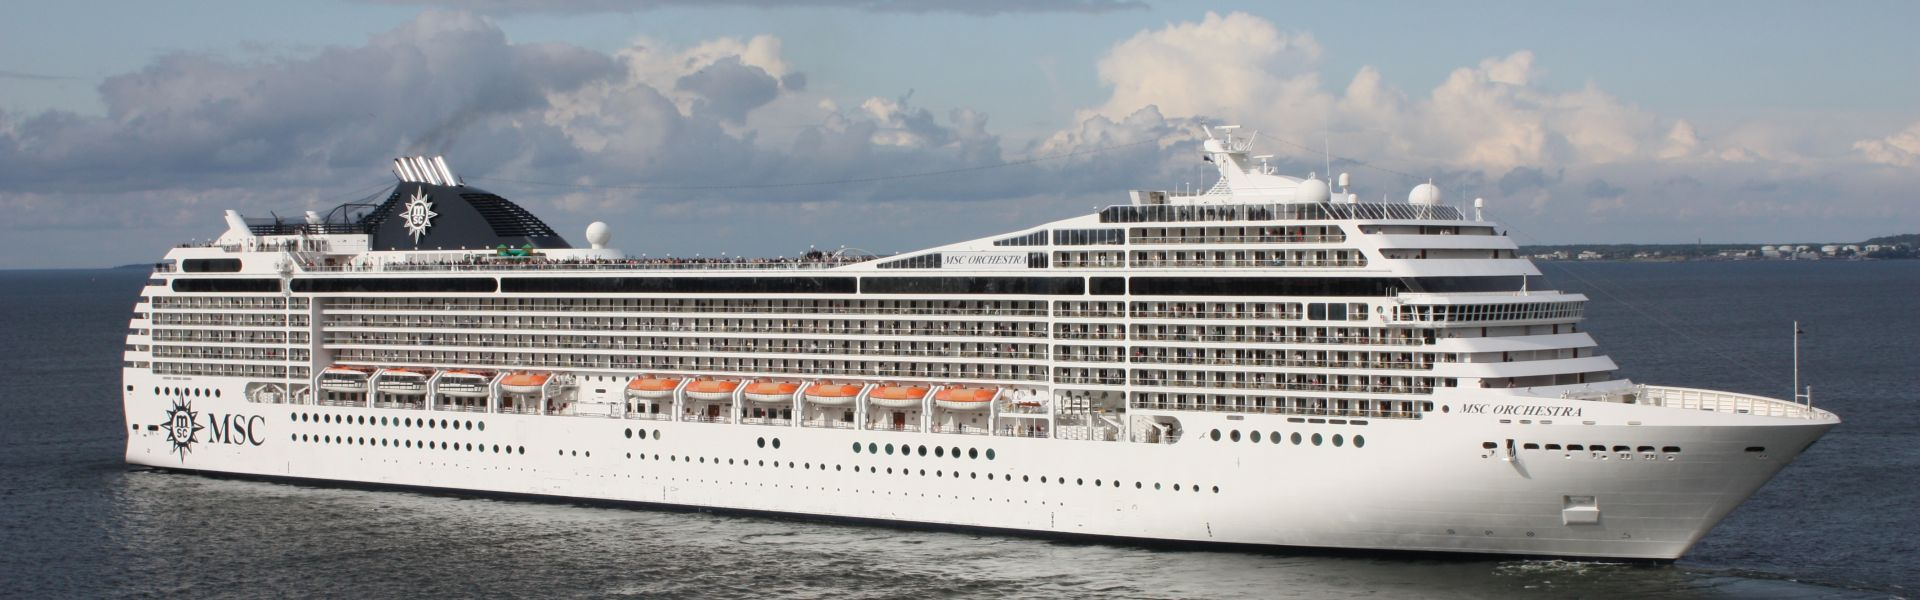 Croaziera 2018 - Scandinavia si Fiordurile Norvegiene (Warnemunde) - MSC Cruises - MSC Orchestra - 11 nopti